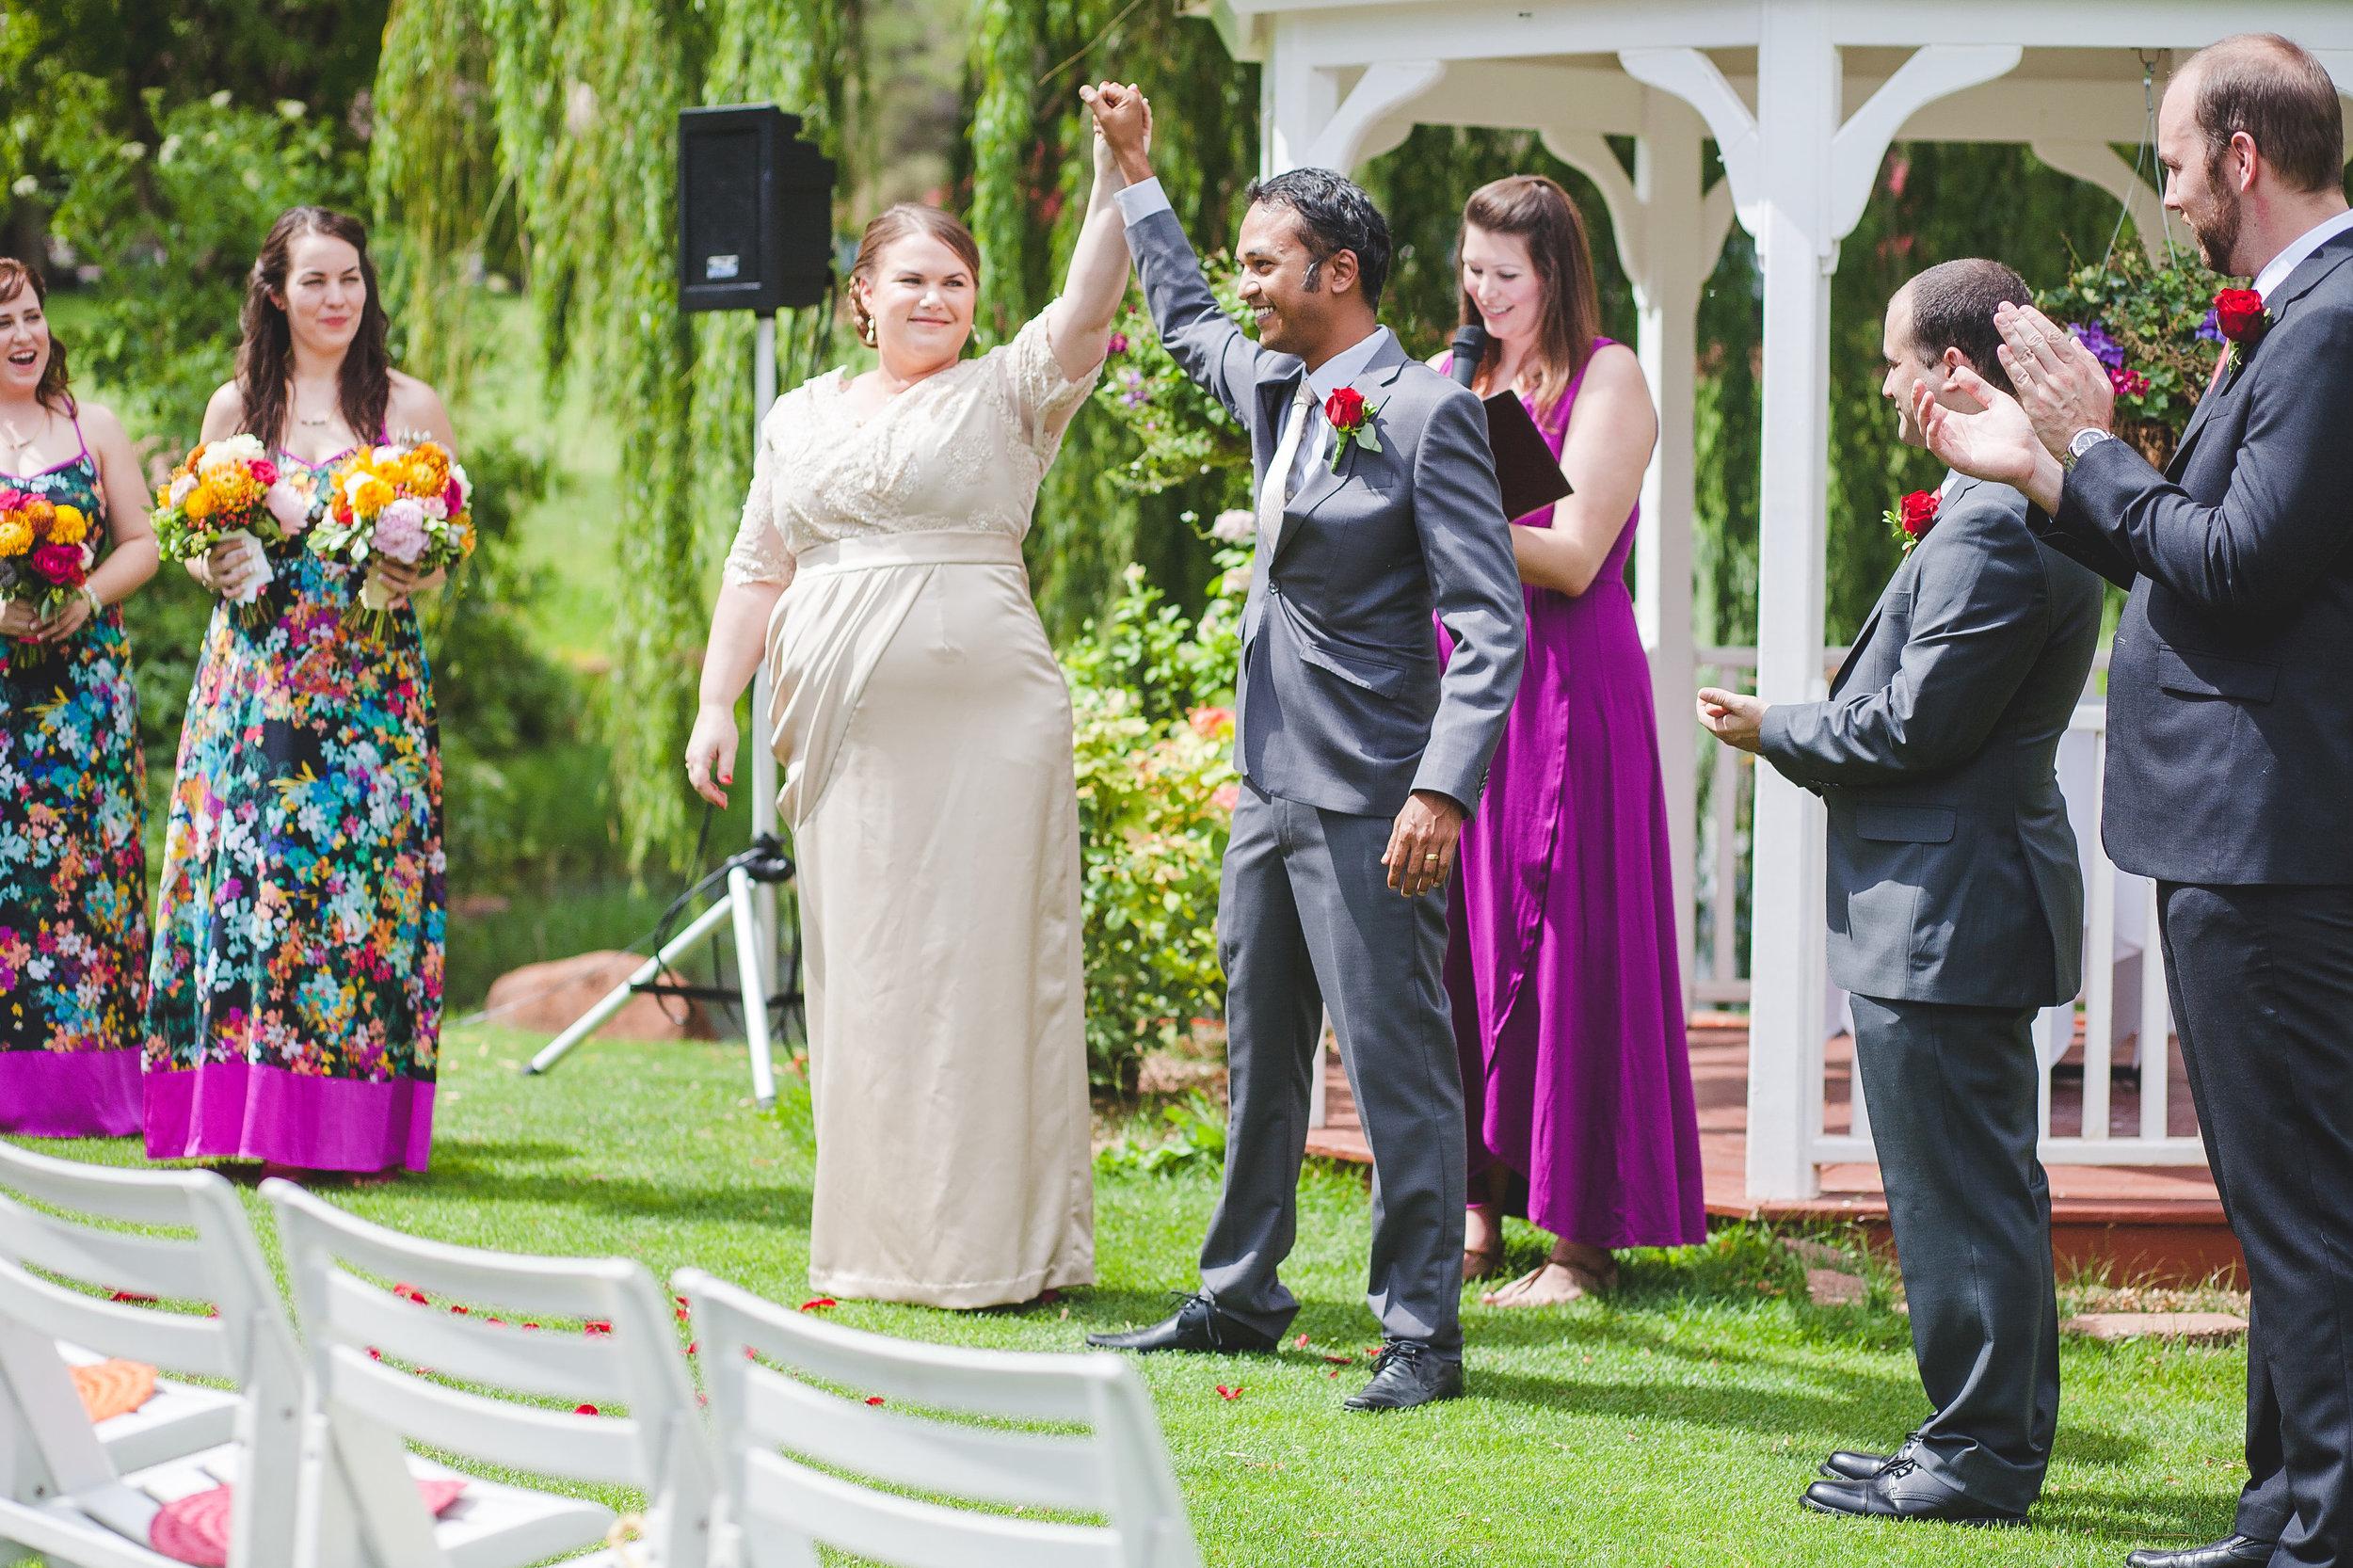 triumphant-bride-and-groom-color-sedona